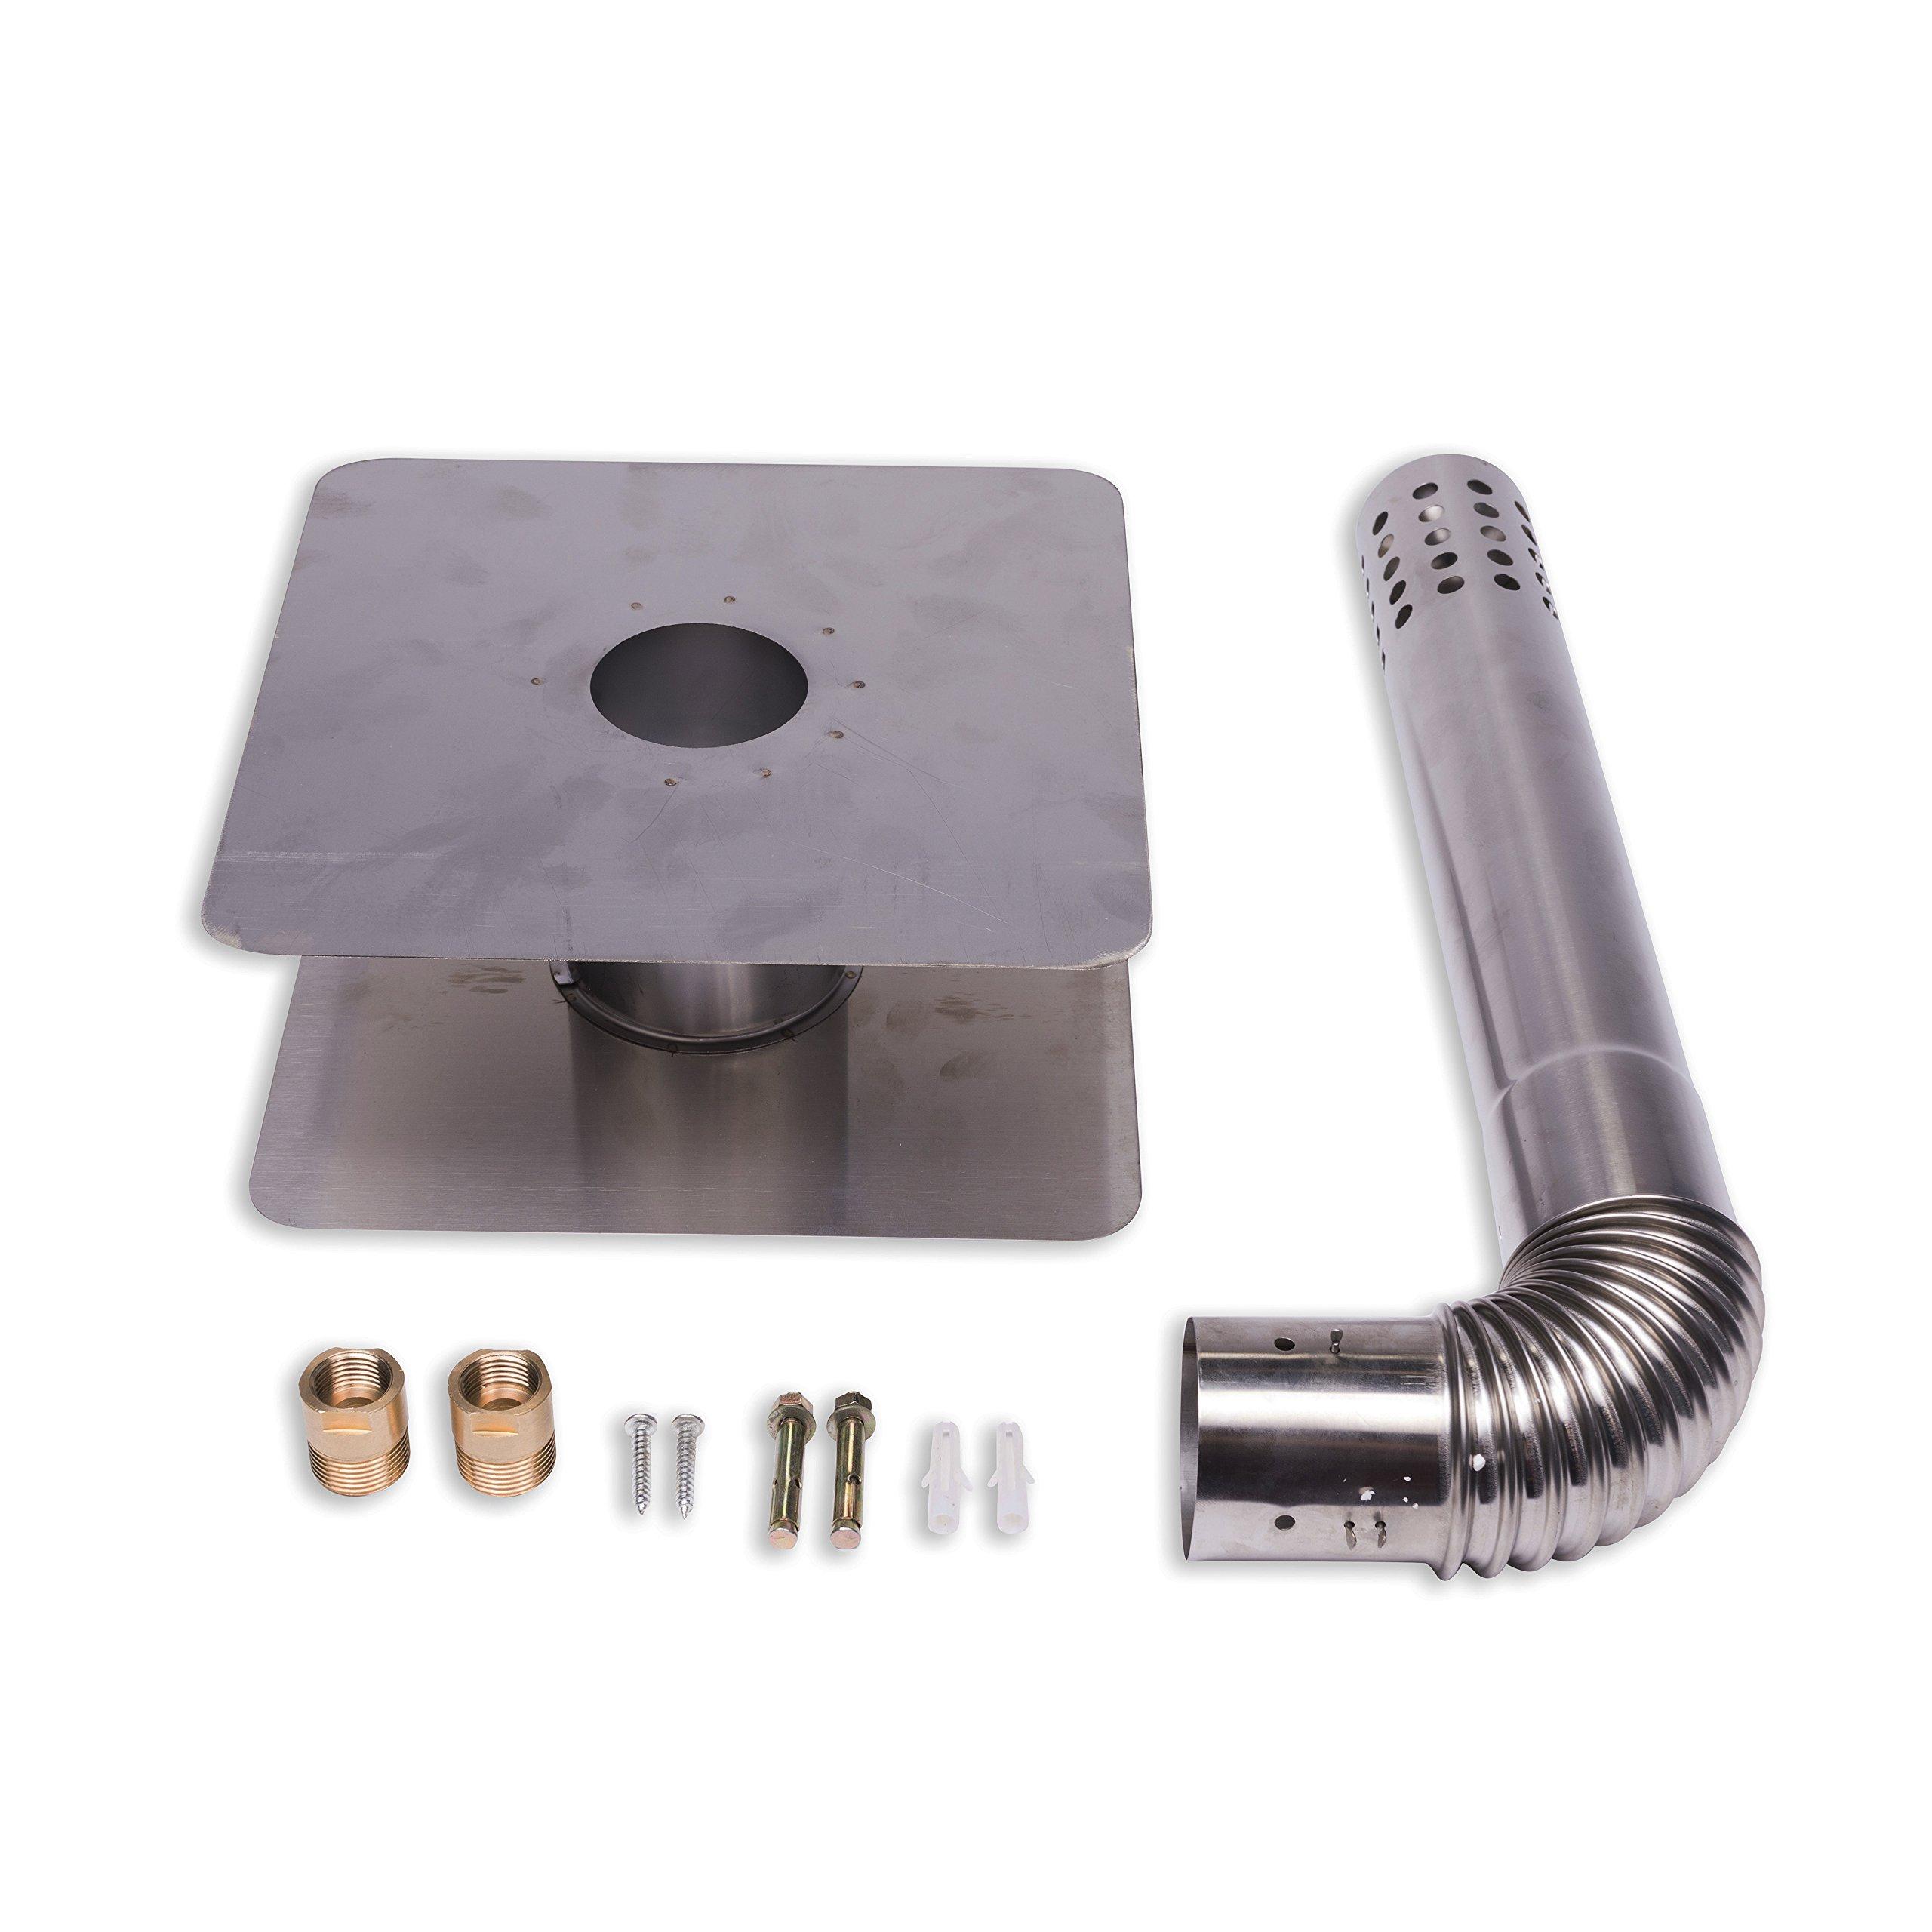 Eccotemp fvi12-NG FVI-12 Natural Gas, 3.5 GPM, High Capacity Tankless Water Heater, White by Eccotemp (Image #6)